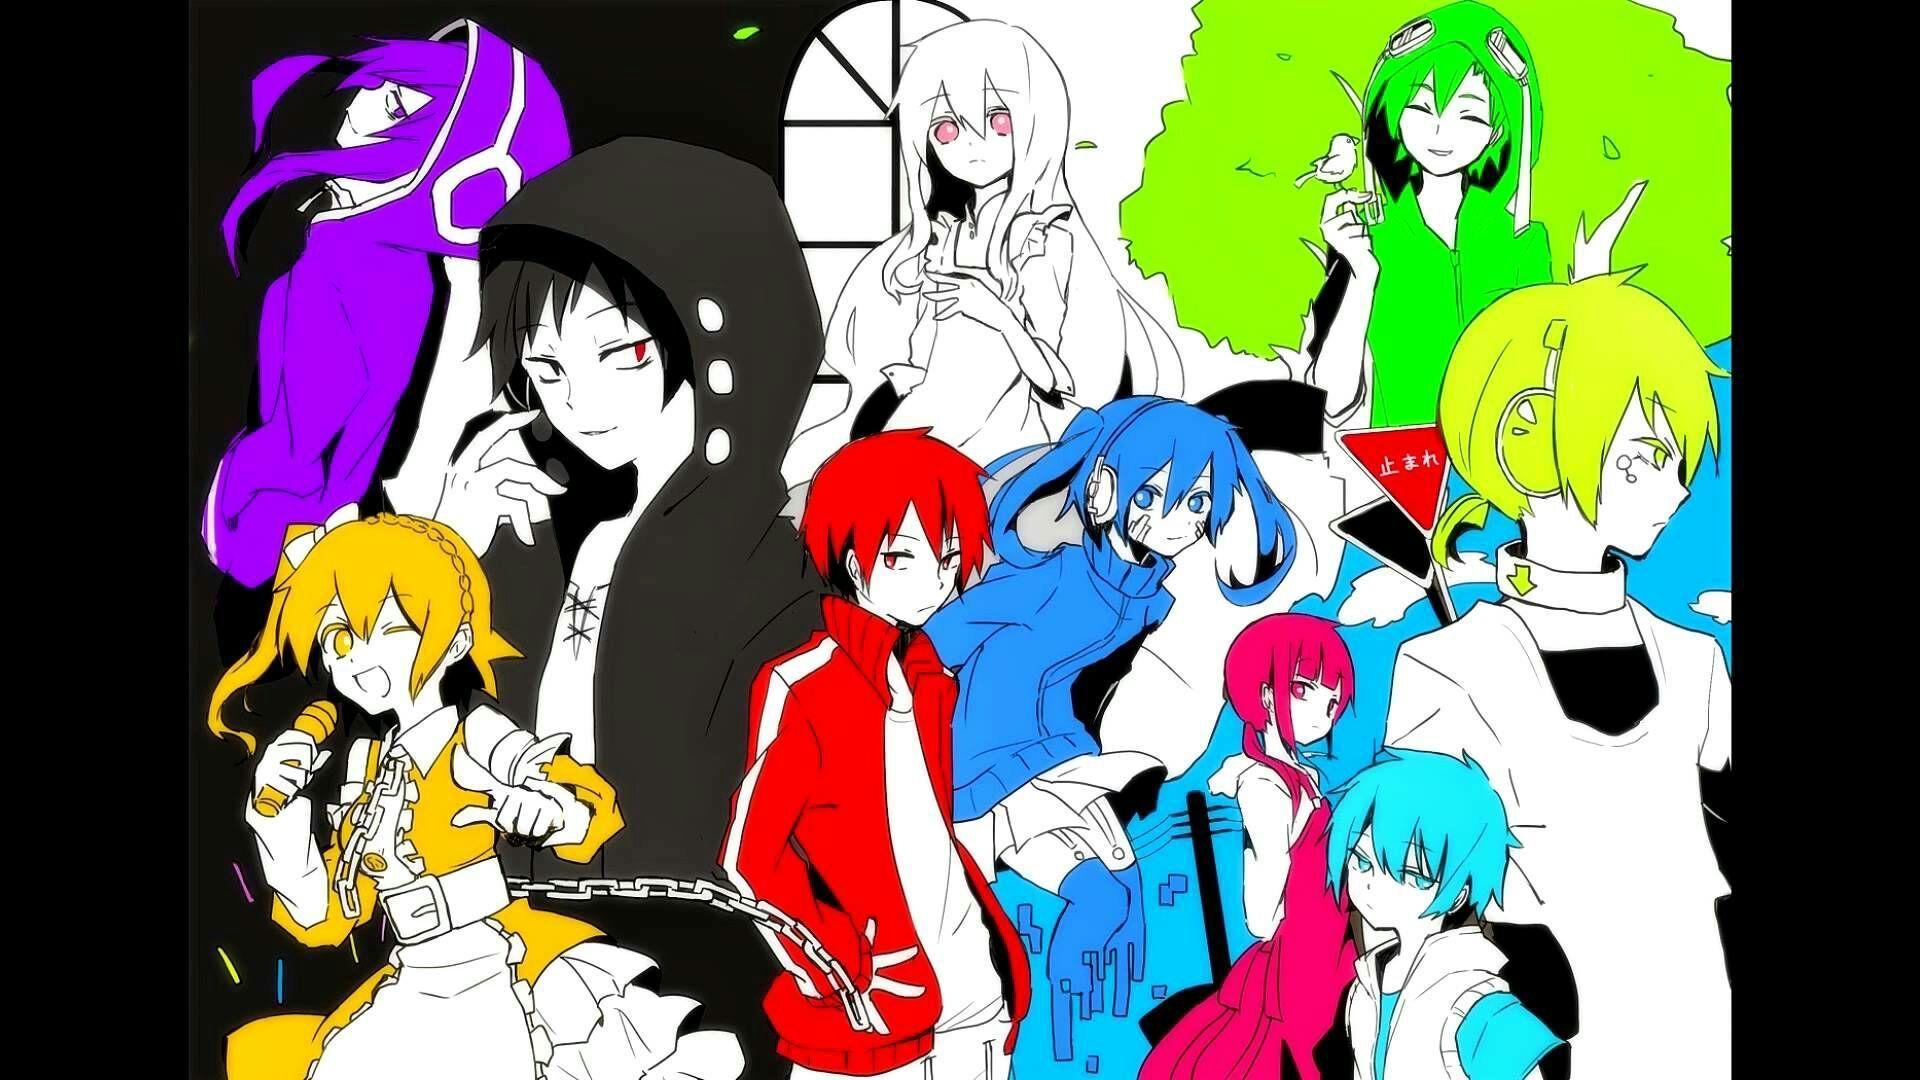 Fondos De Pantalla Sobre Anime - MakakuCity Actors